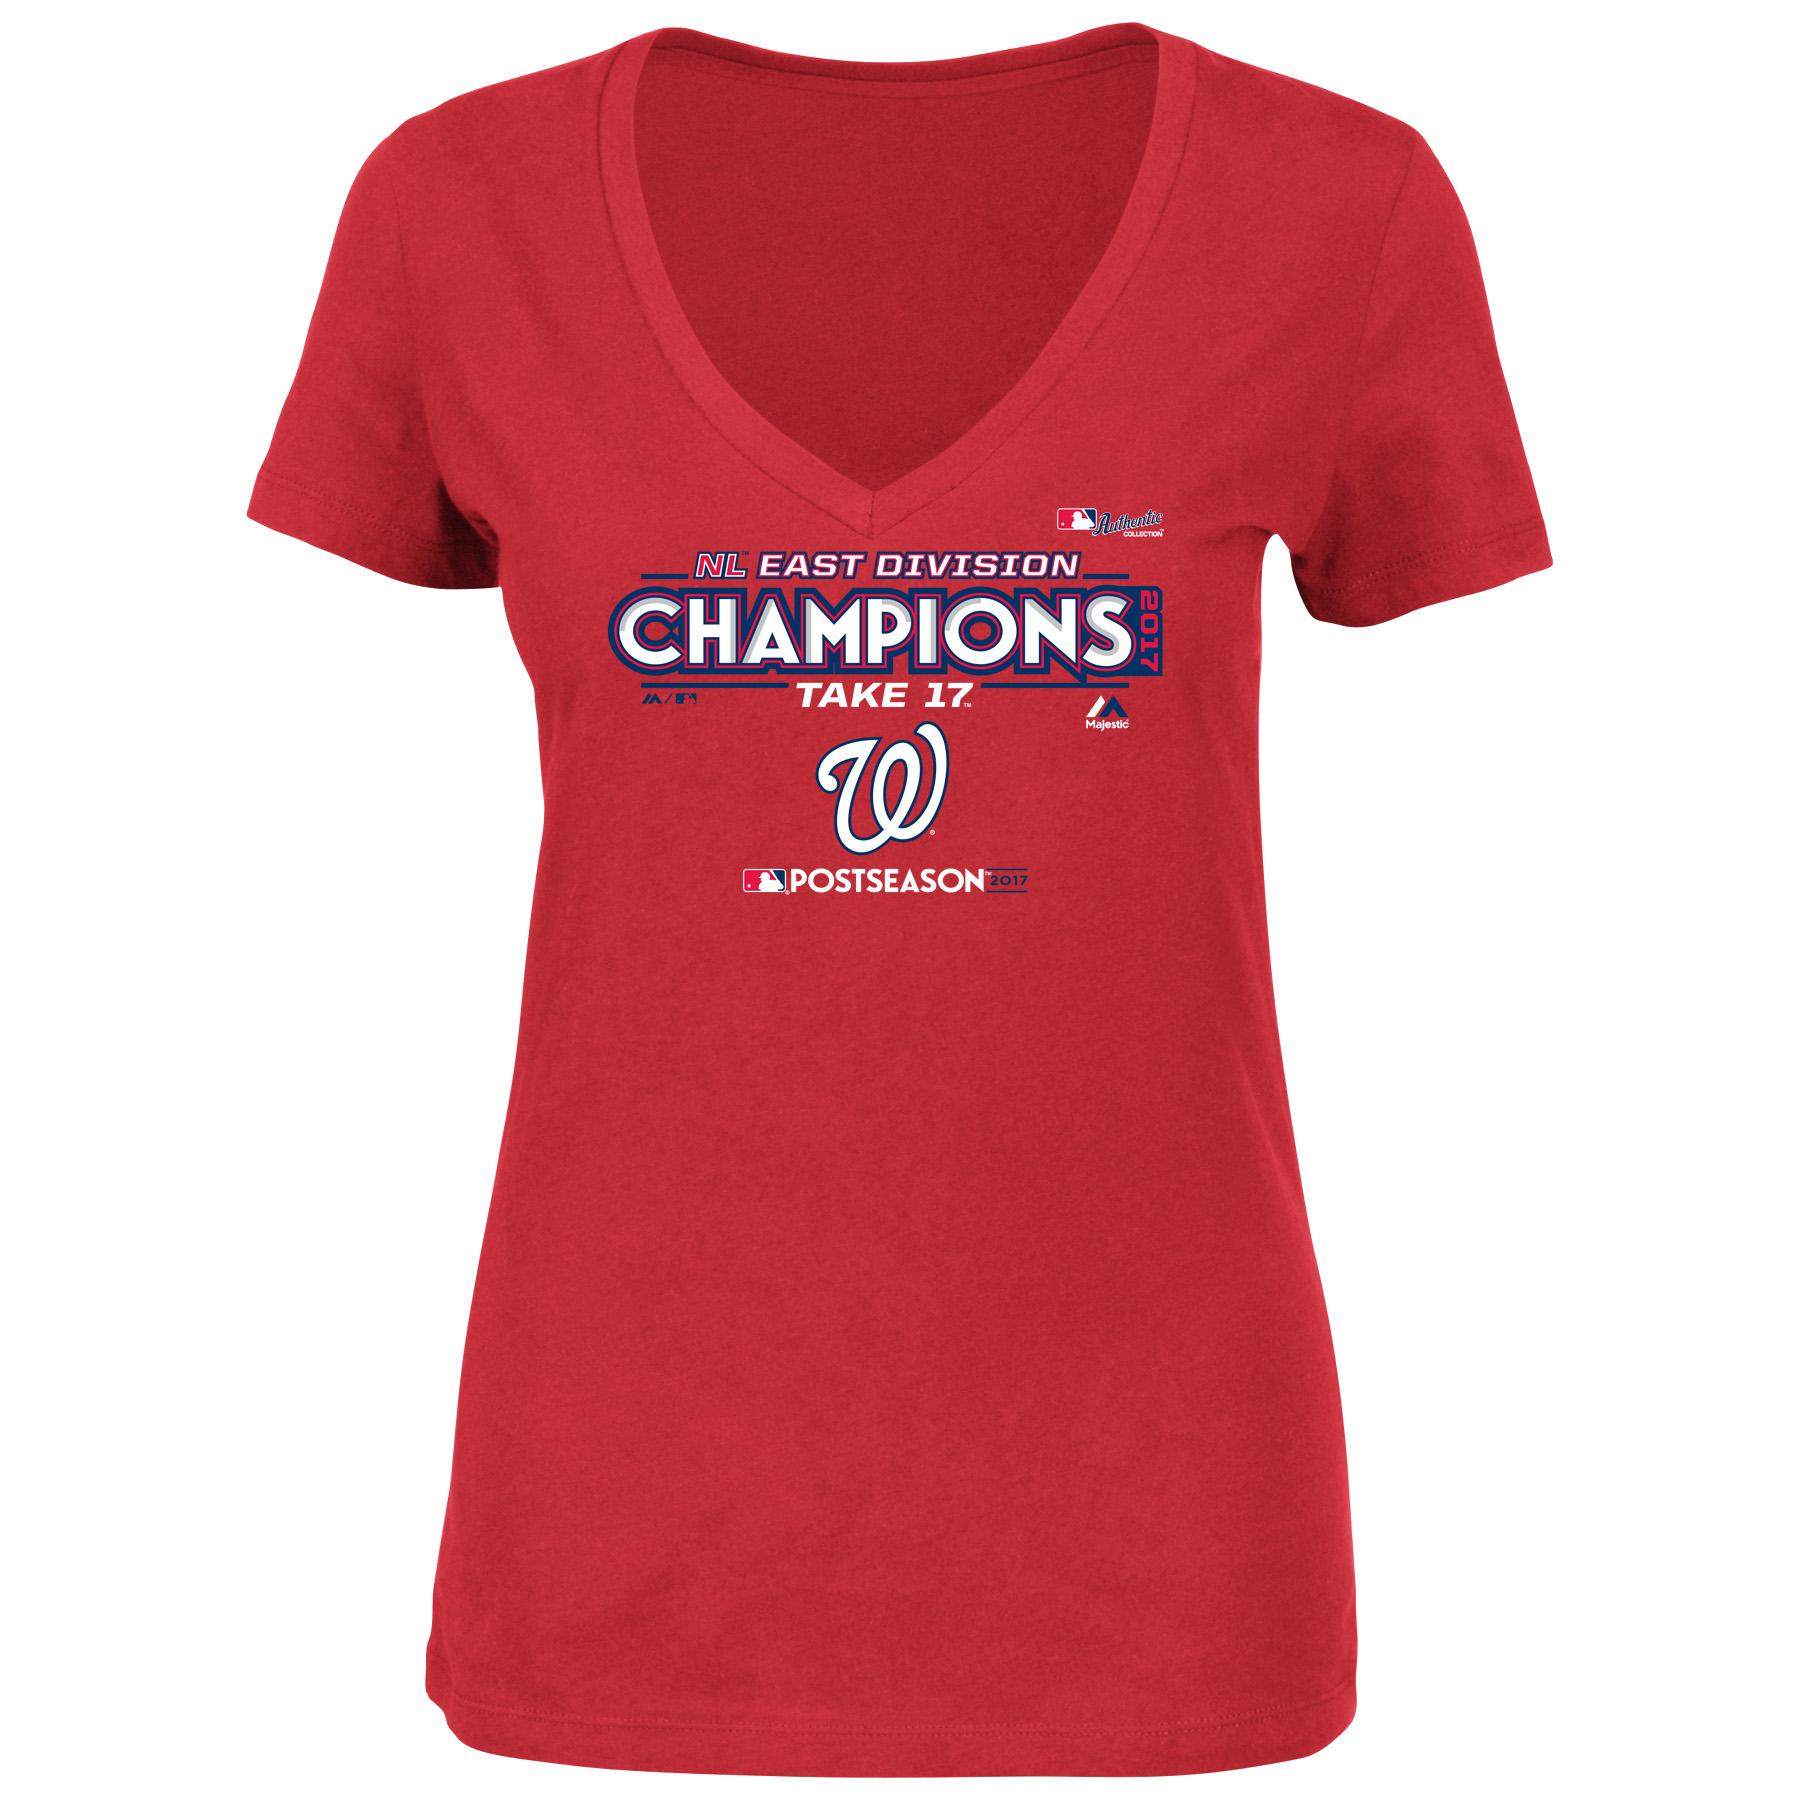 Washington Nationals Majestic Women's 2017 Division Champions Plus Size V-Neck T-Shirt - Red